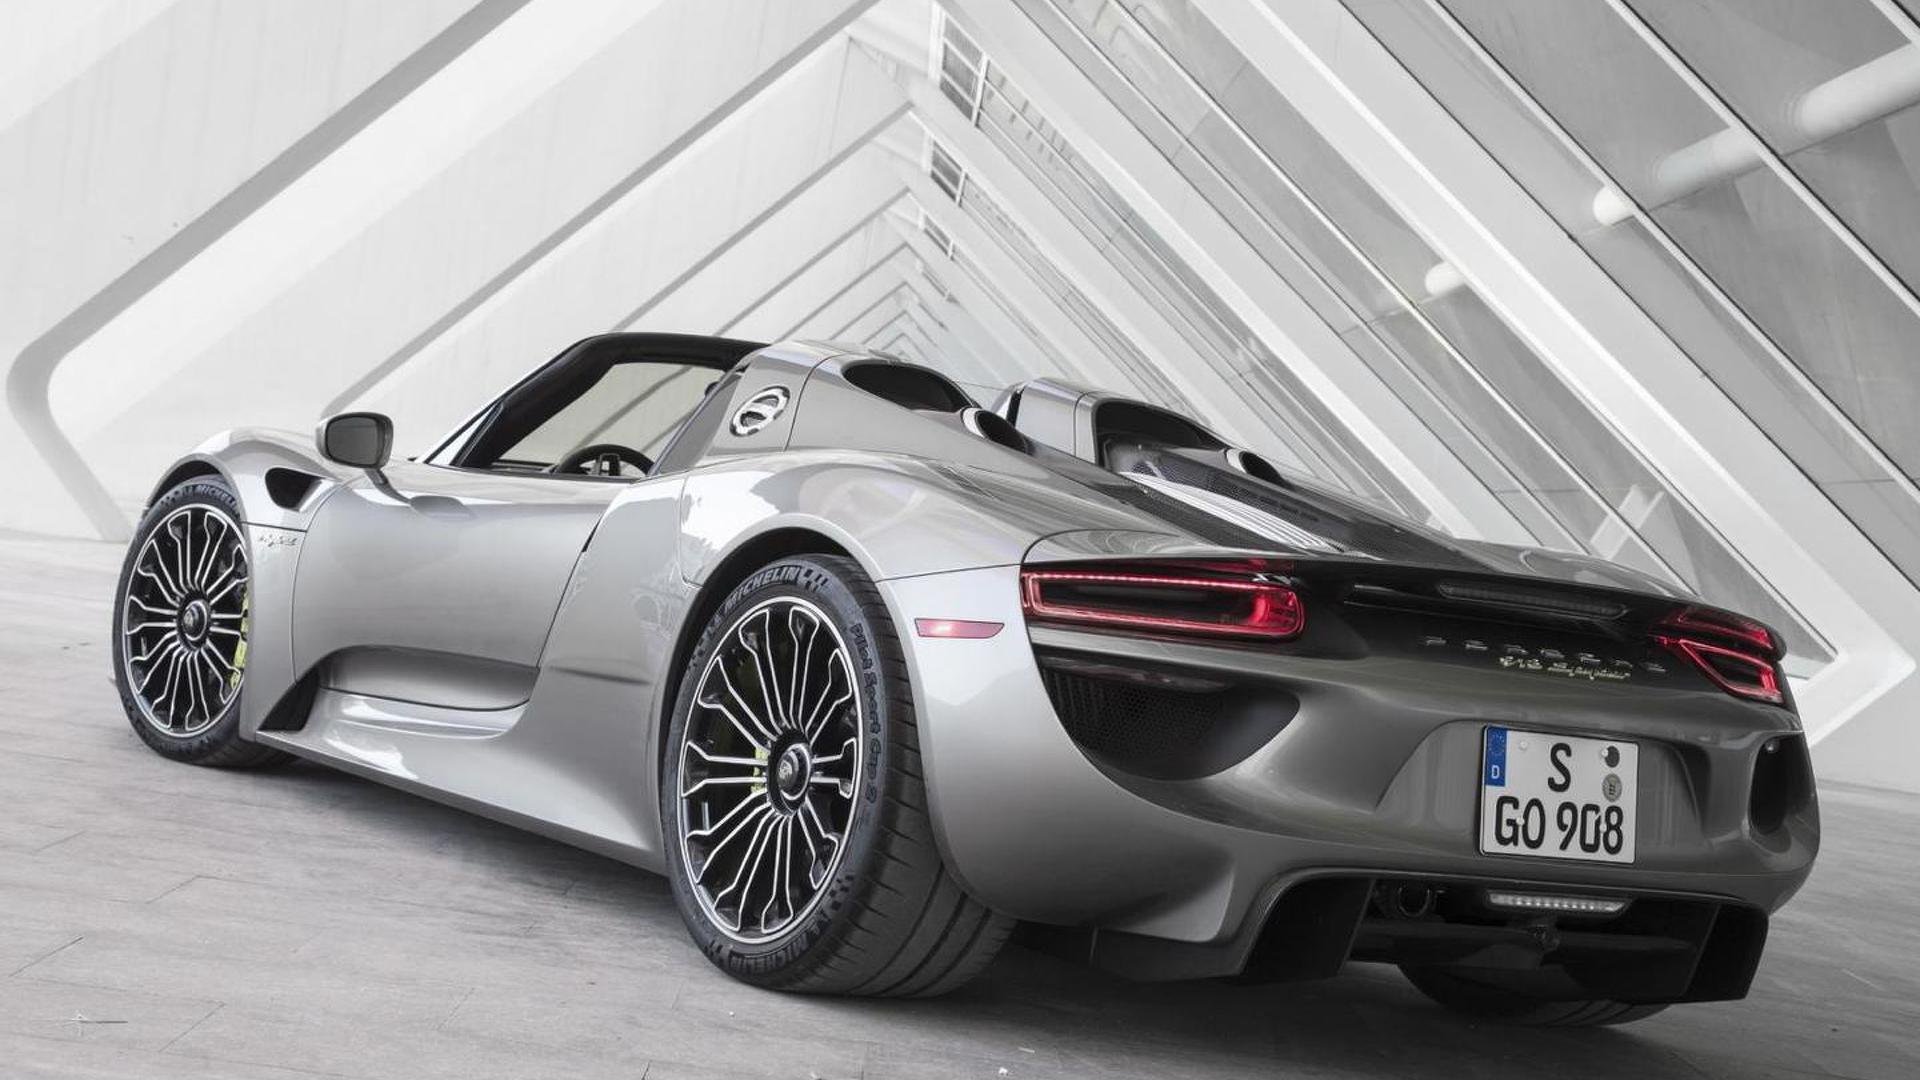 2013-434866-2014-porsche-918-spyder-us-spec1 Amazing Porsche 918 Spyder sold Out Cars Trend